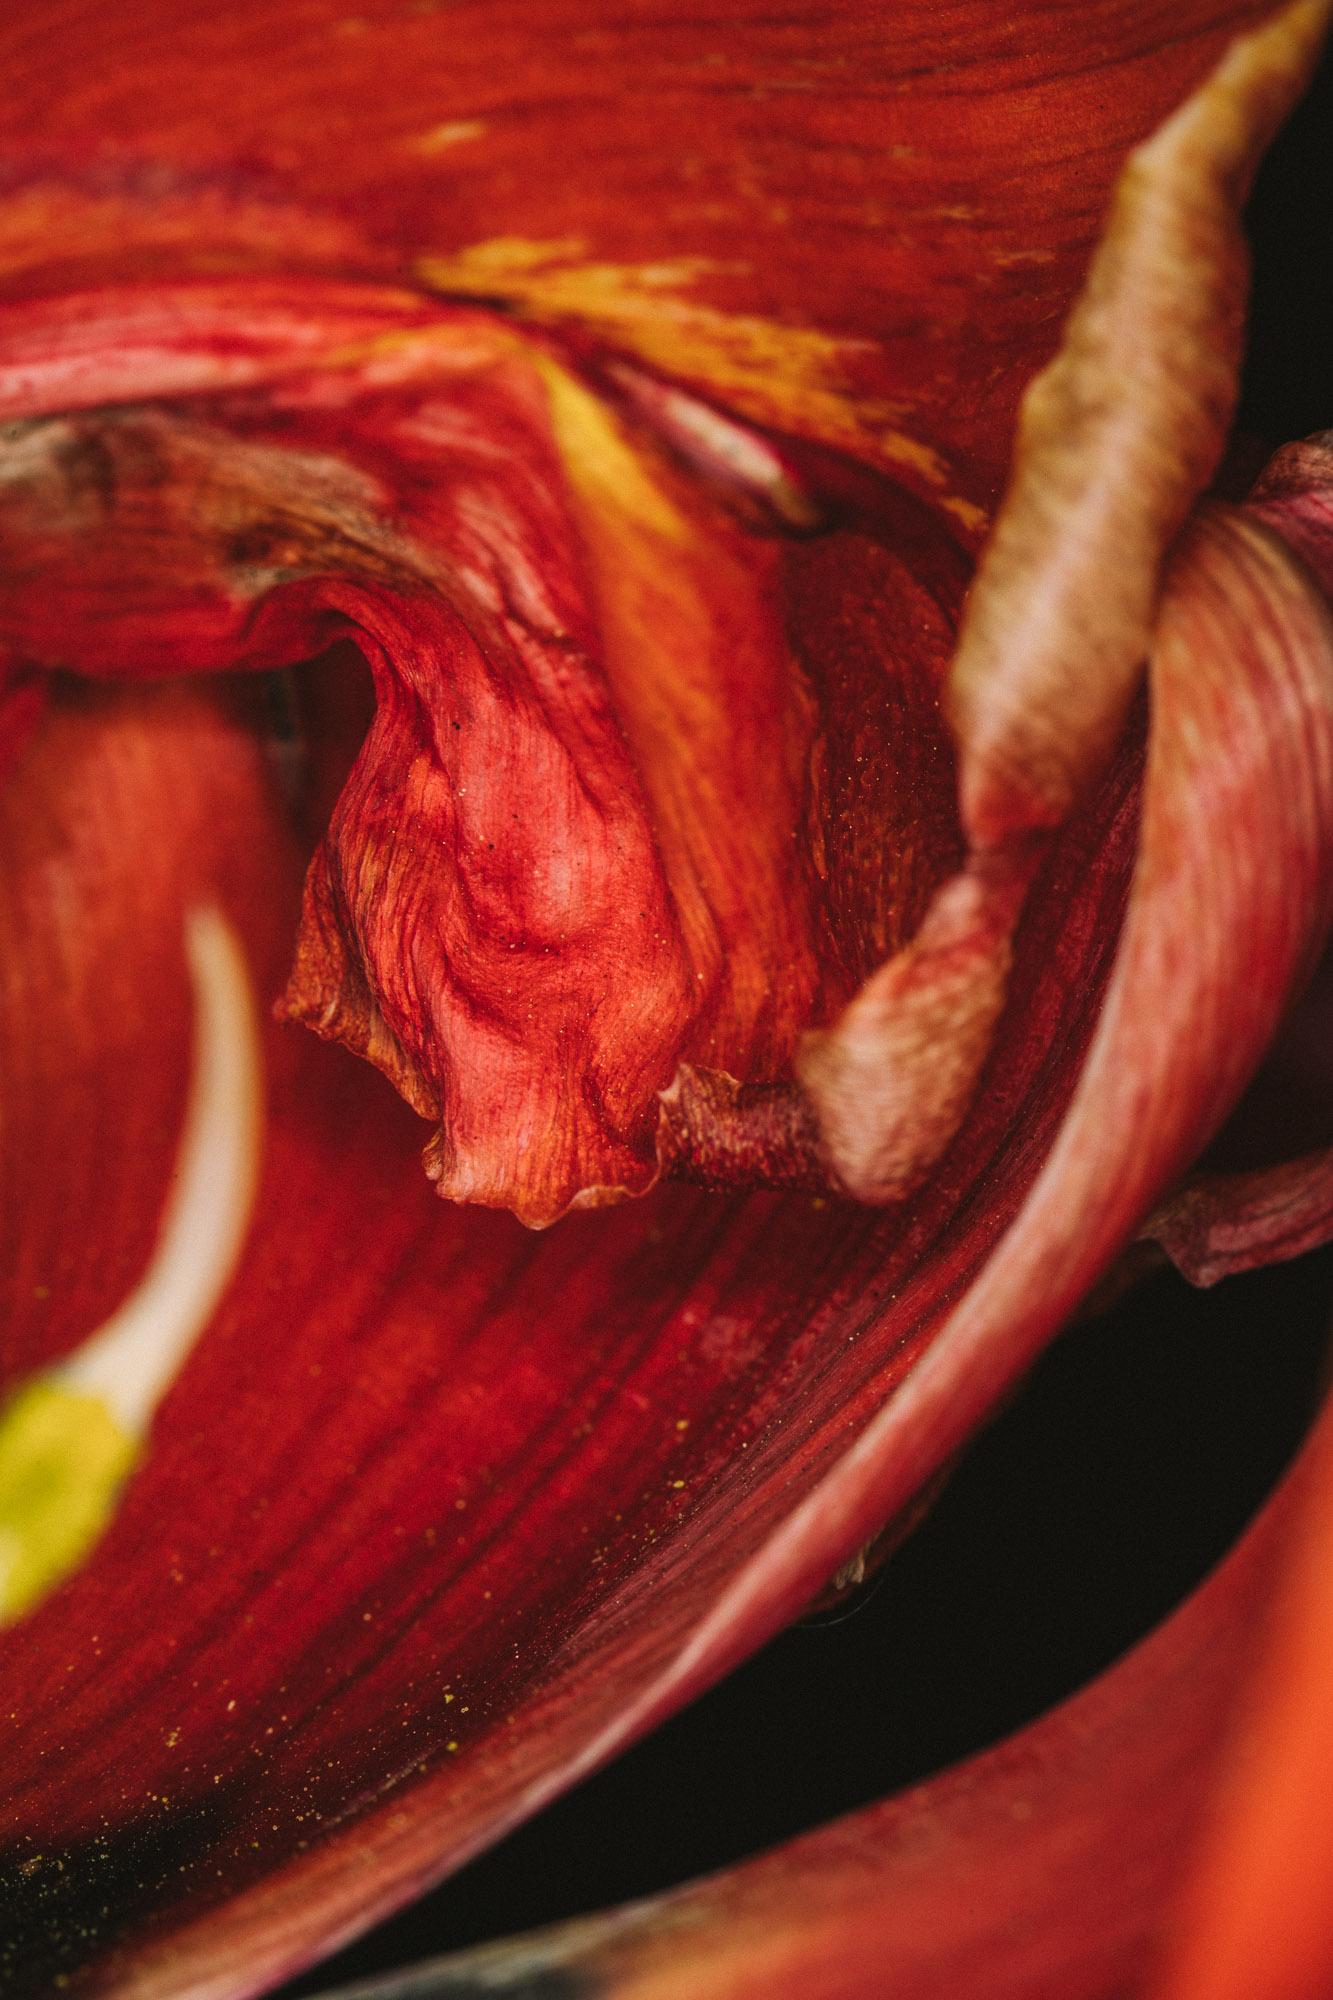 20180420_tulips_0170.jpg